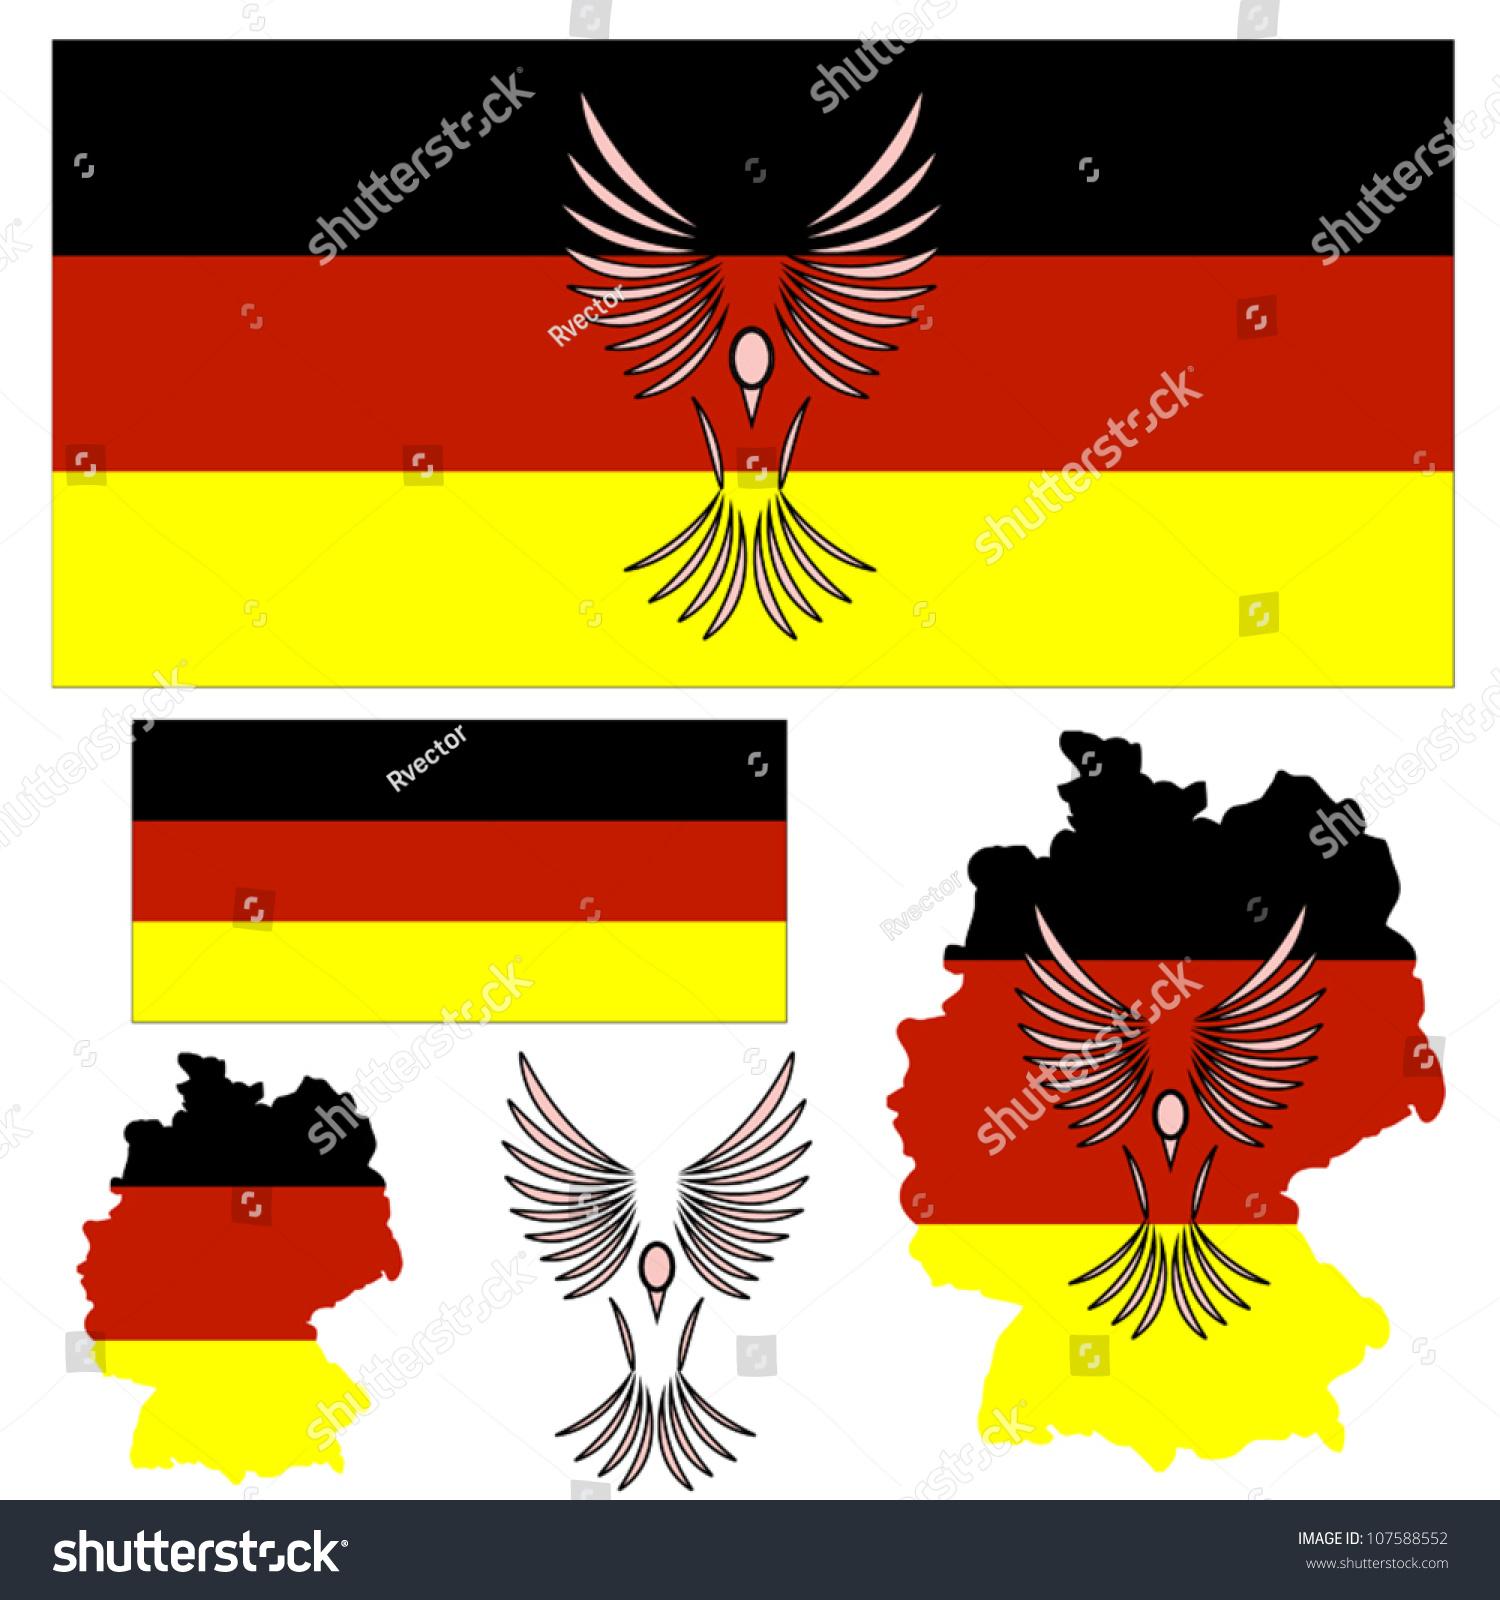 German flag symbol bird other elements stock vector 107588552 german flag and symbol of a bird and other elements sciox Choice Image